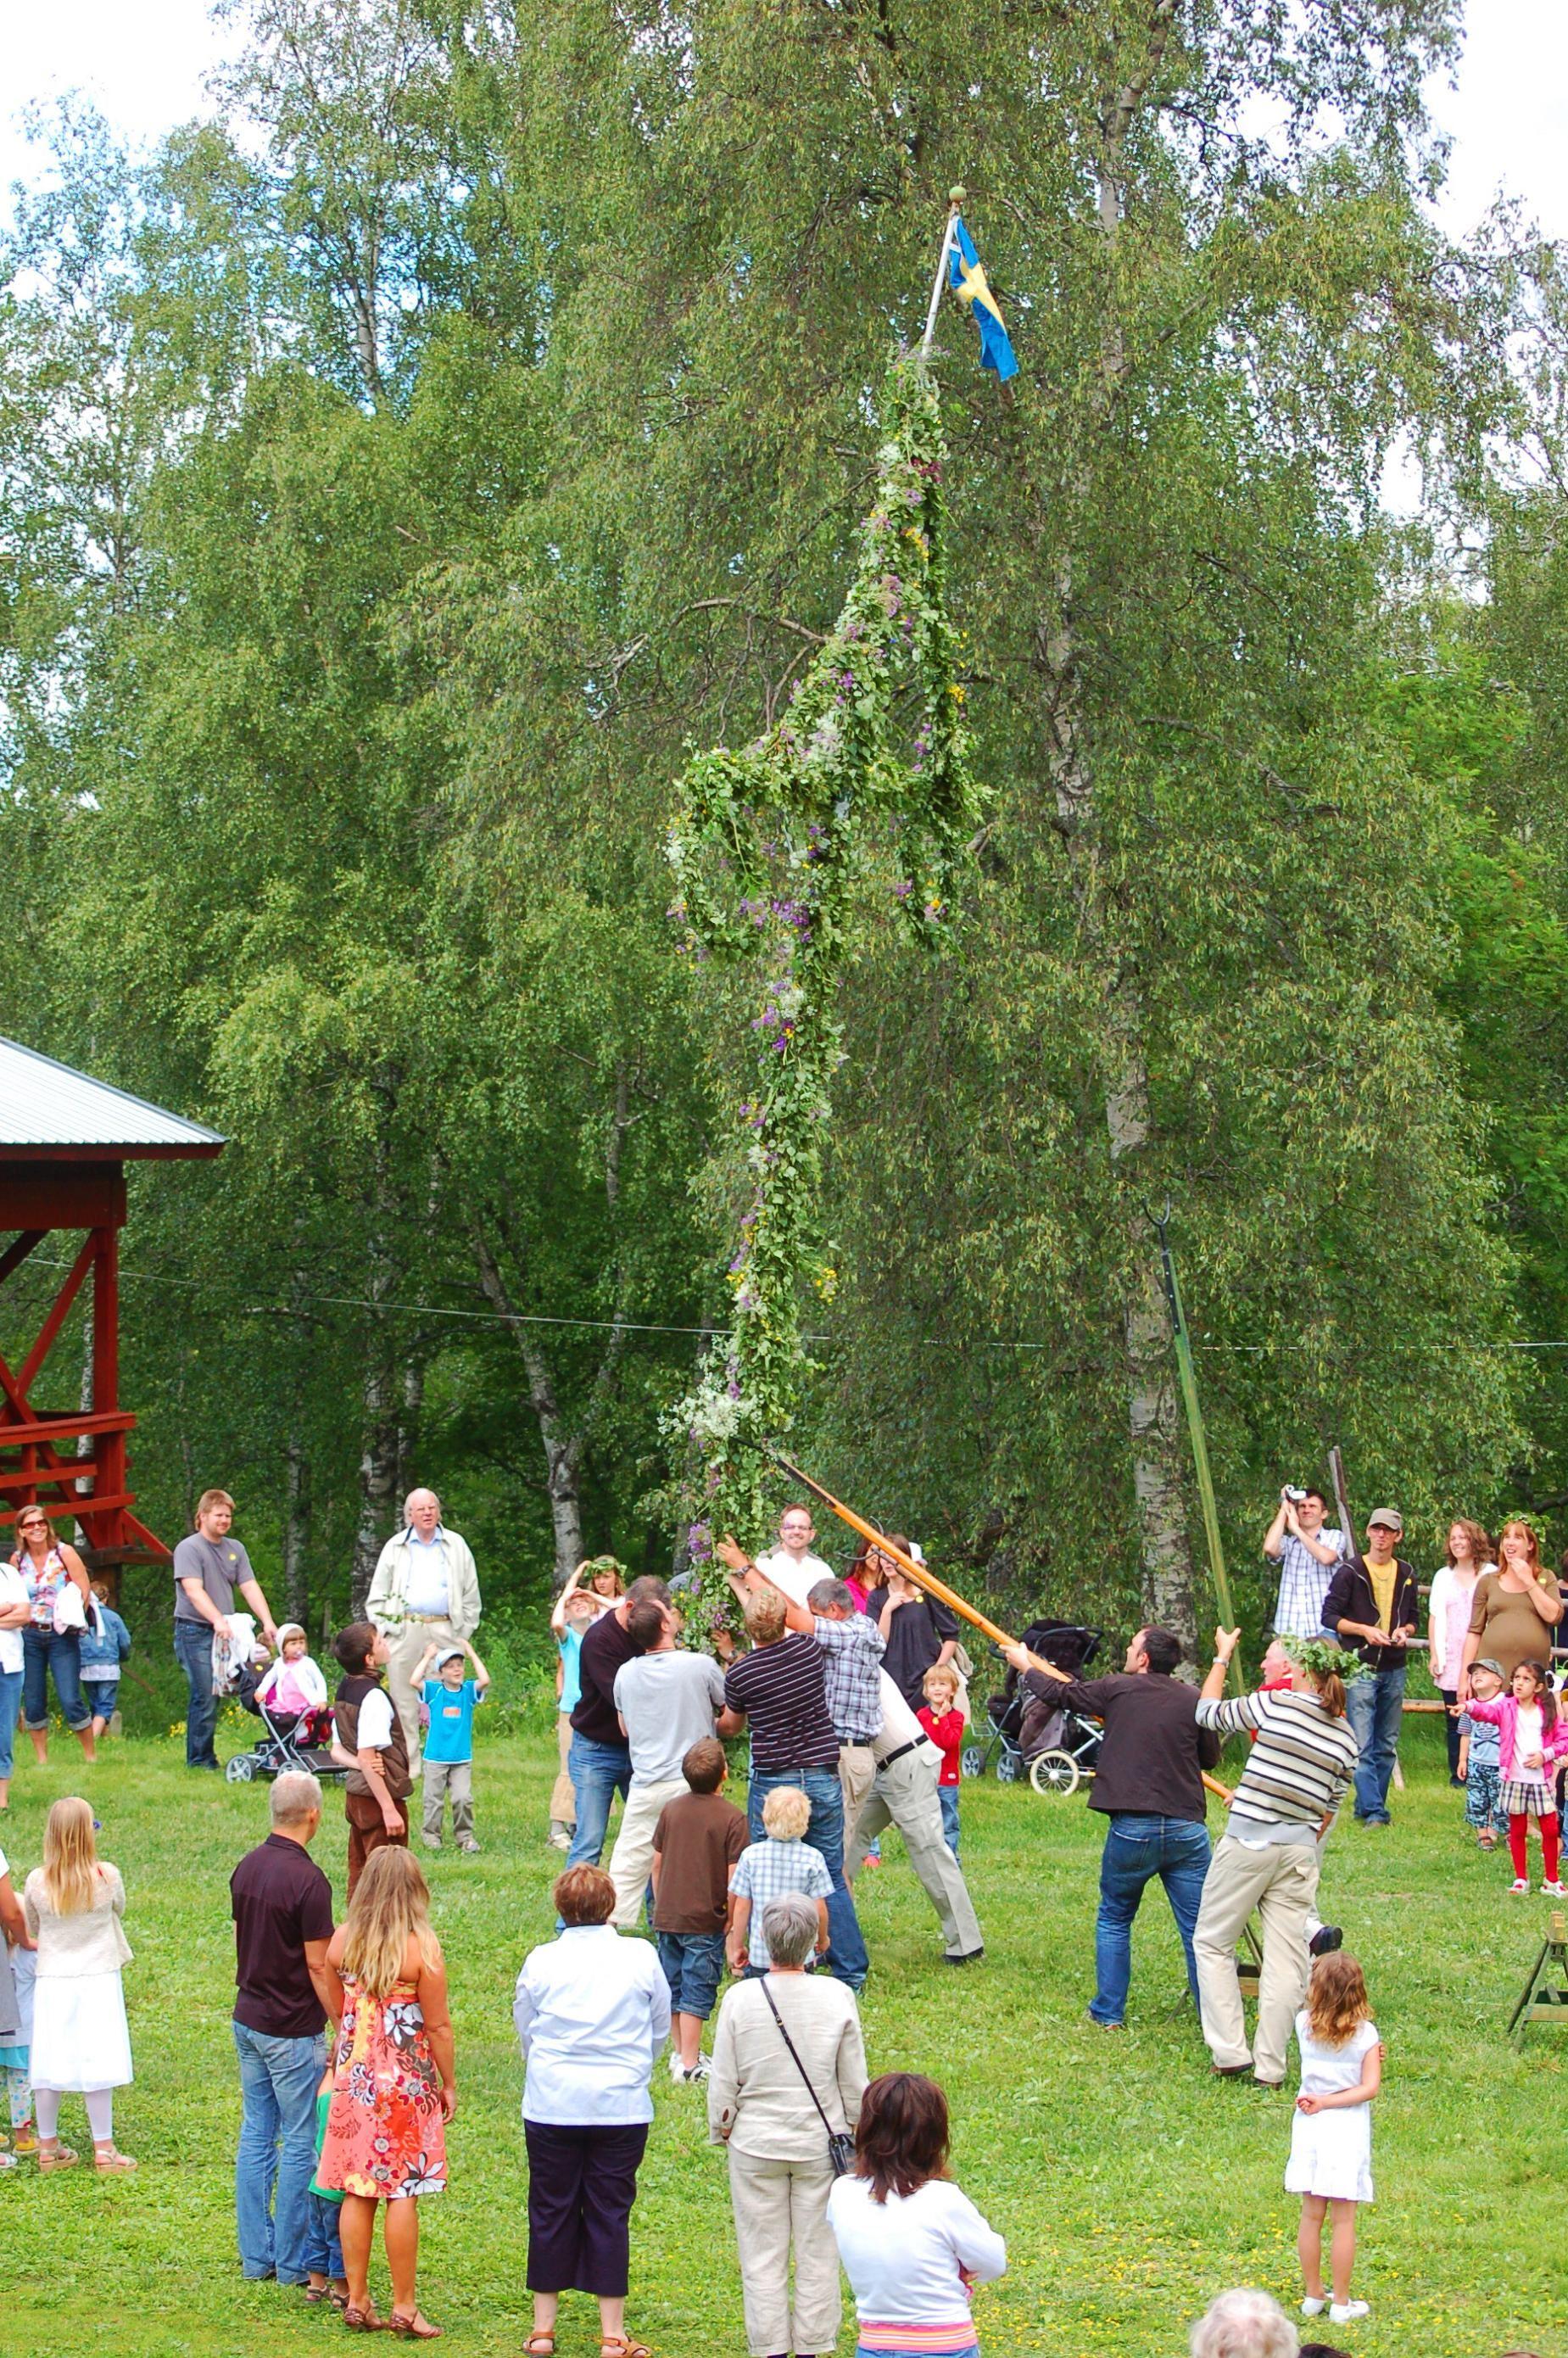 Foto: Media Lupus, Sollefteå Heritage Centre, Ådalsbyn (copy)